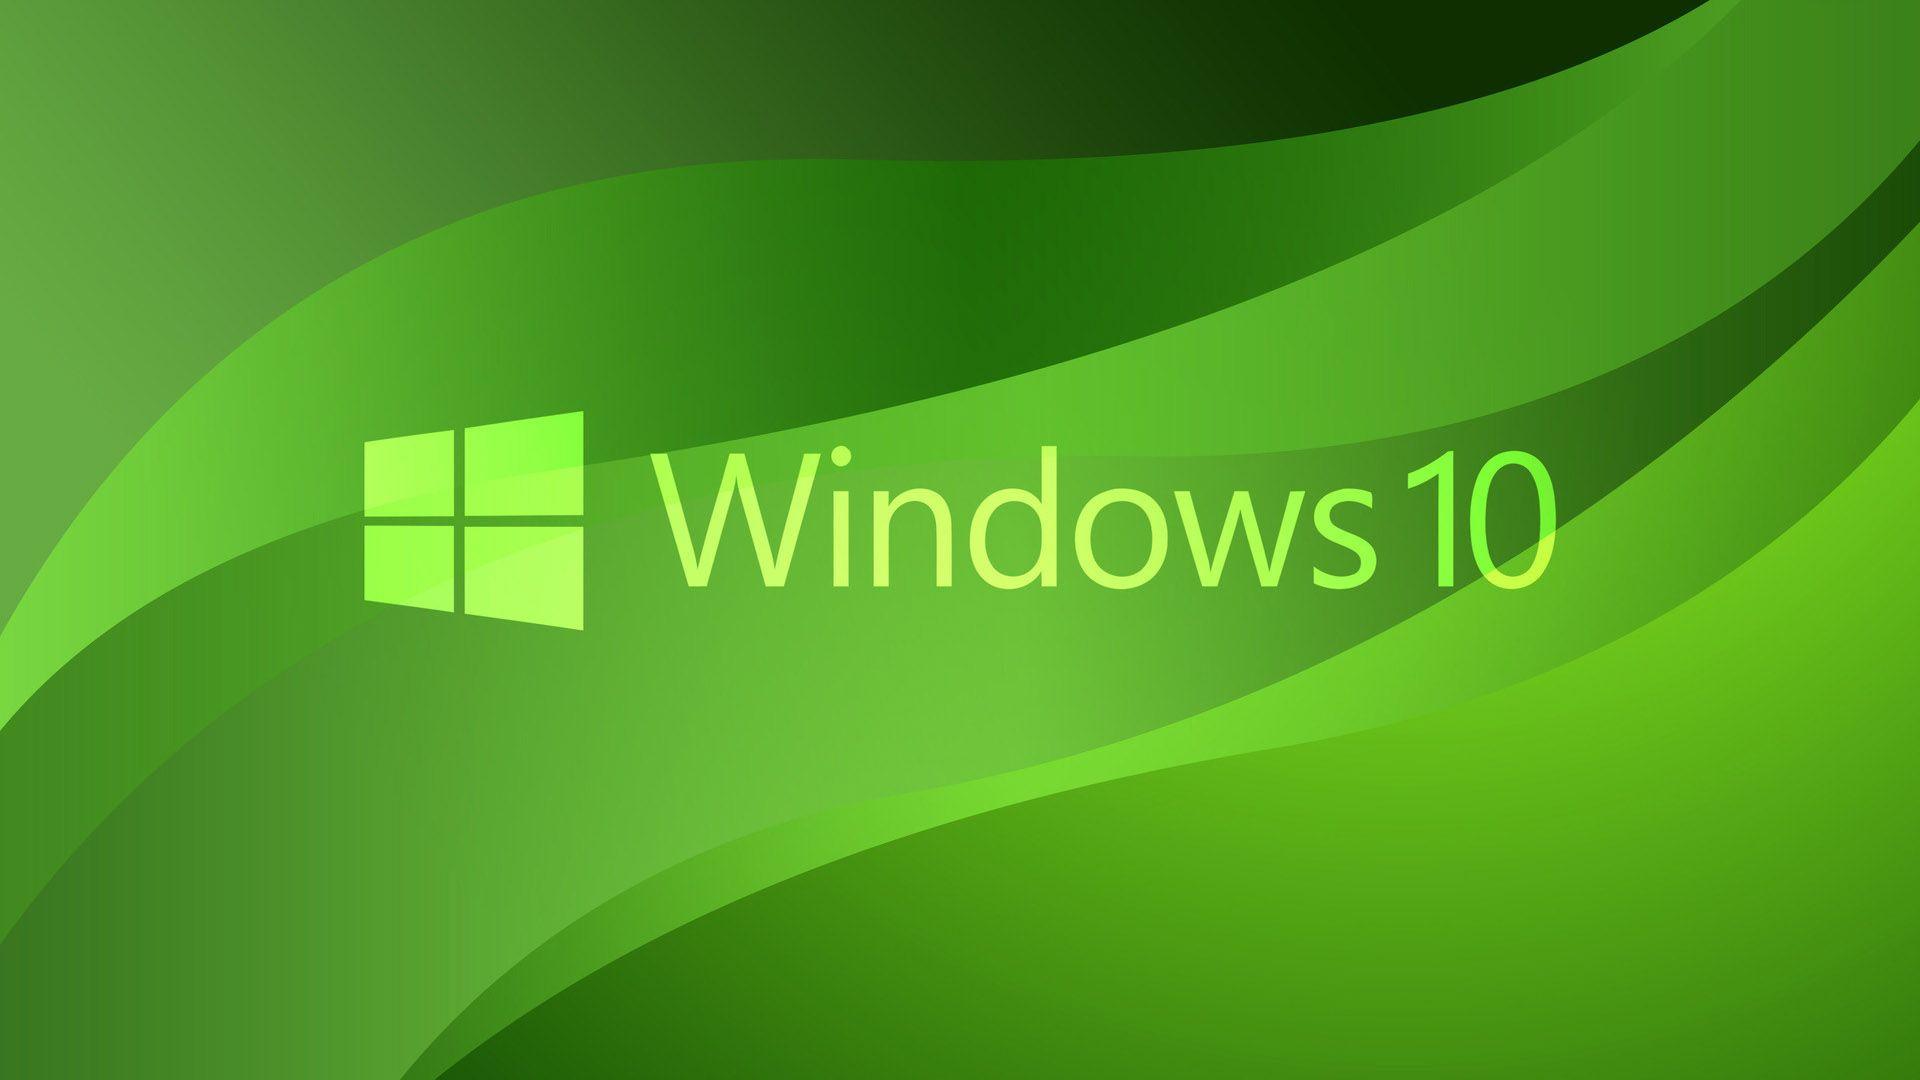 Logo Green Windows 10 Wavs Windows 10 Windows 10 Logo Windows